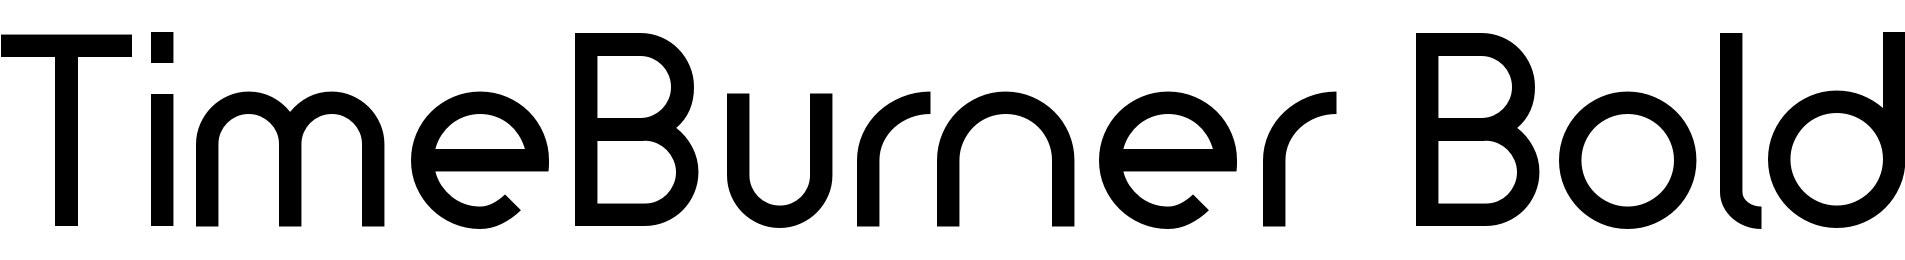 TimeBurner Bold